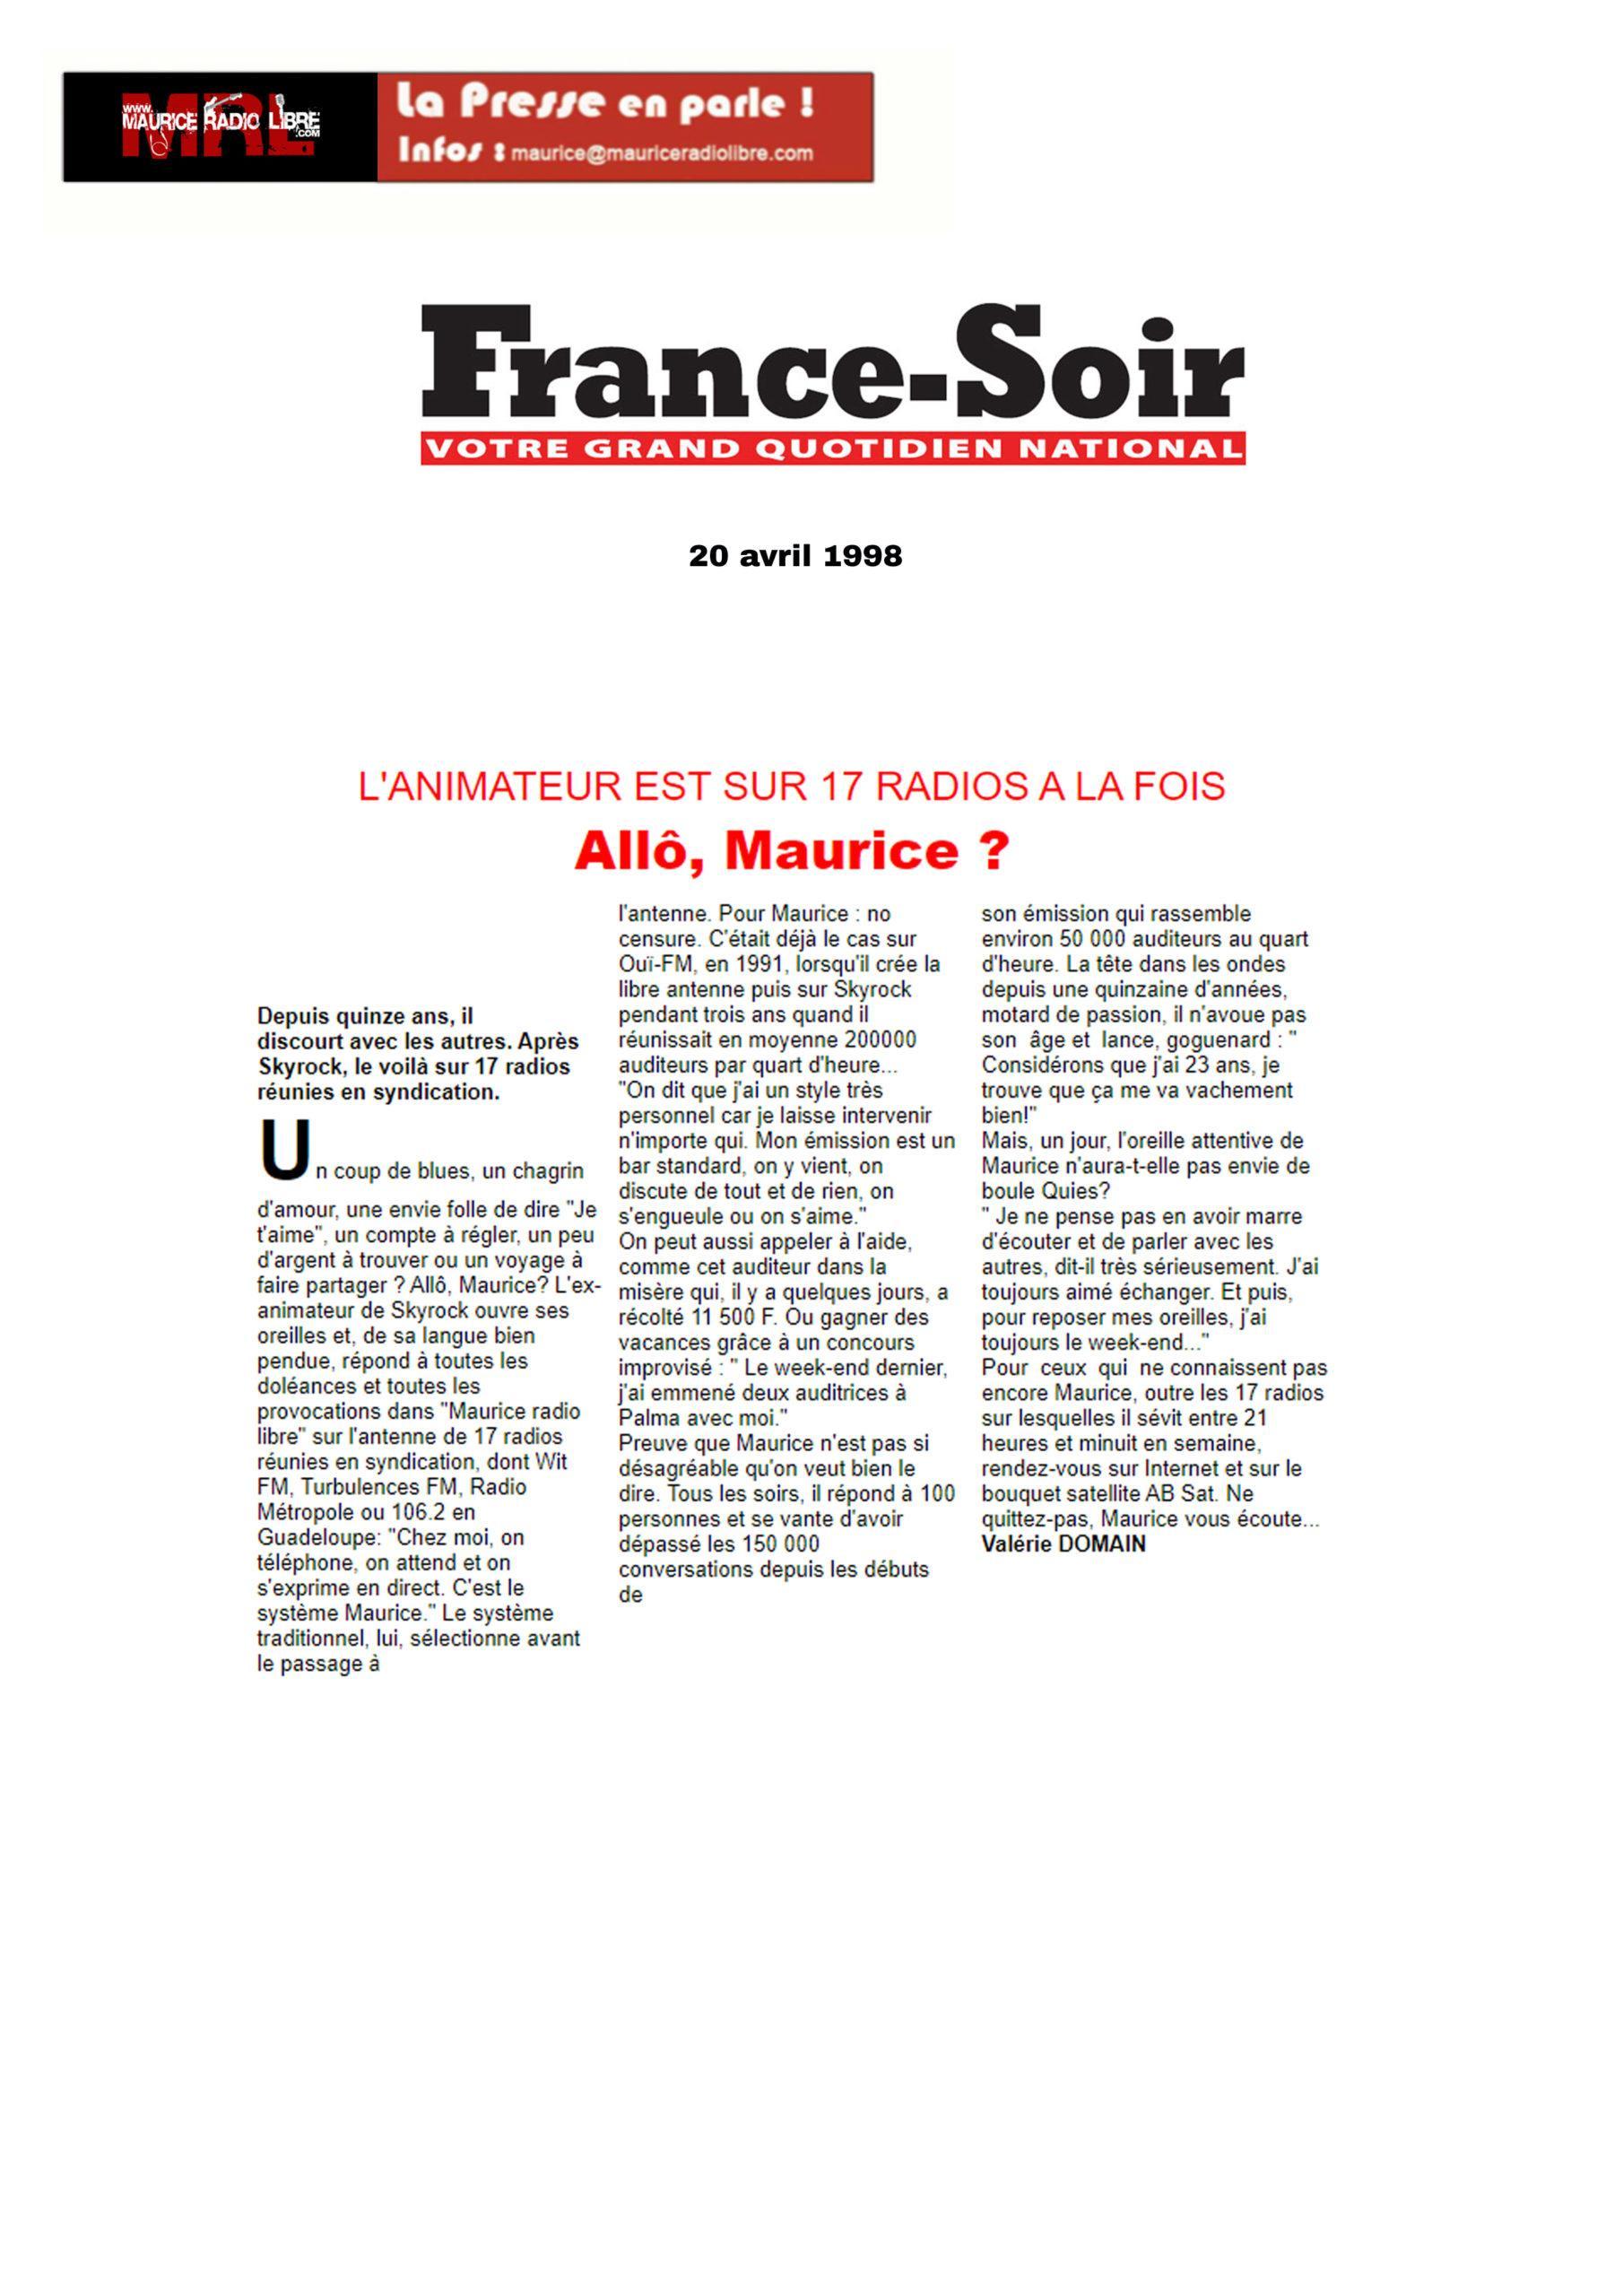 vignette France Soir Allô, Maurice ? - 20/04/1998